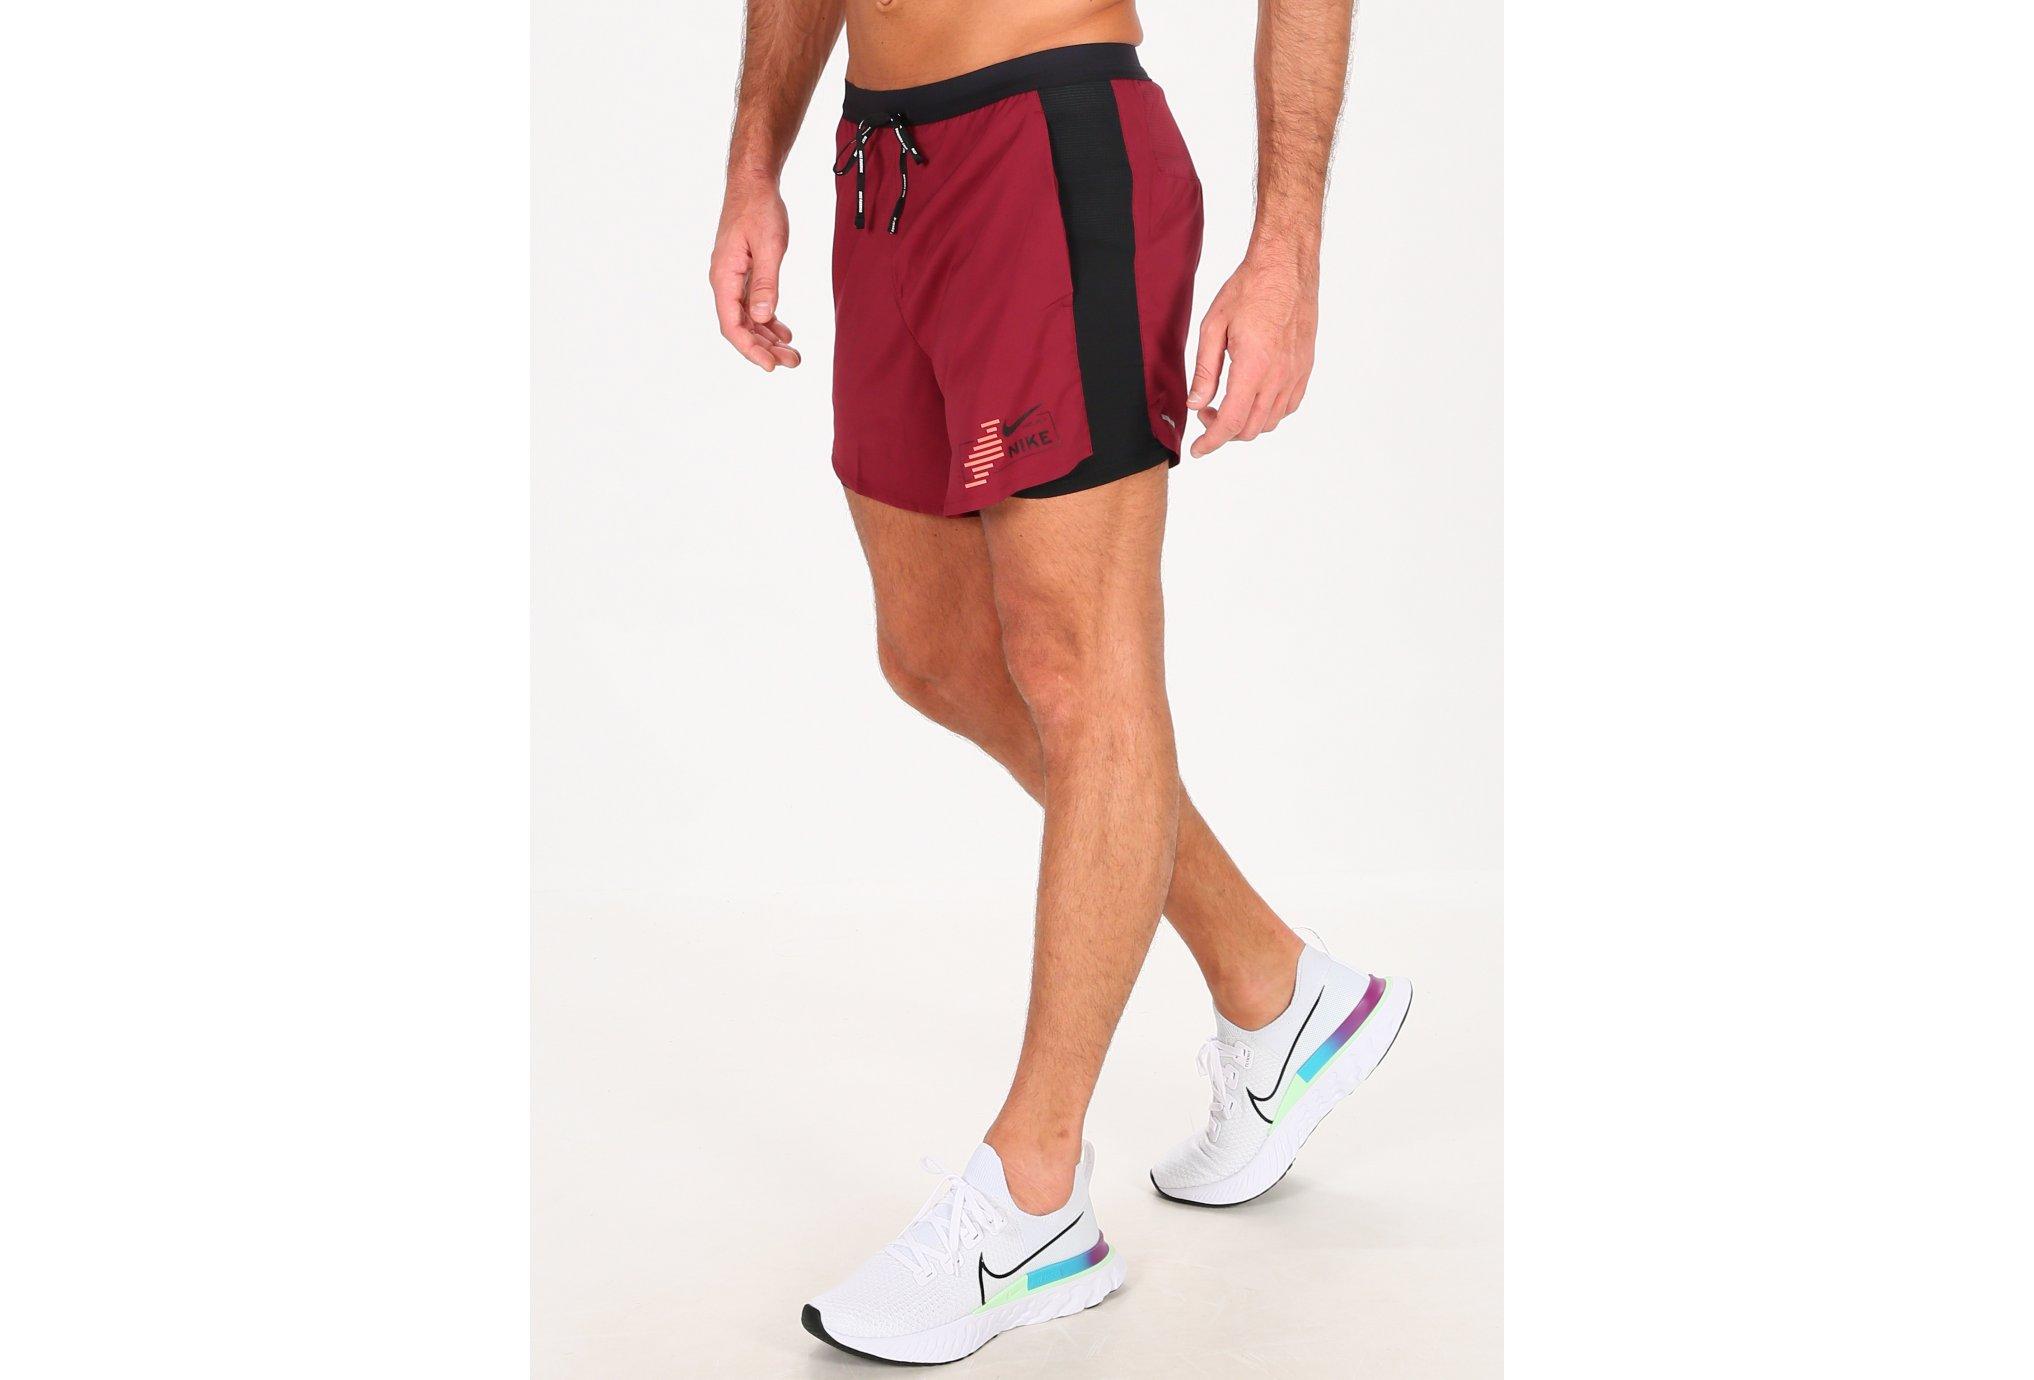 Nike Flex Stride Future Fast 2 en 1 M vêtement running homme